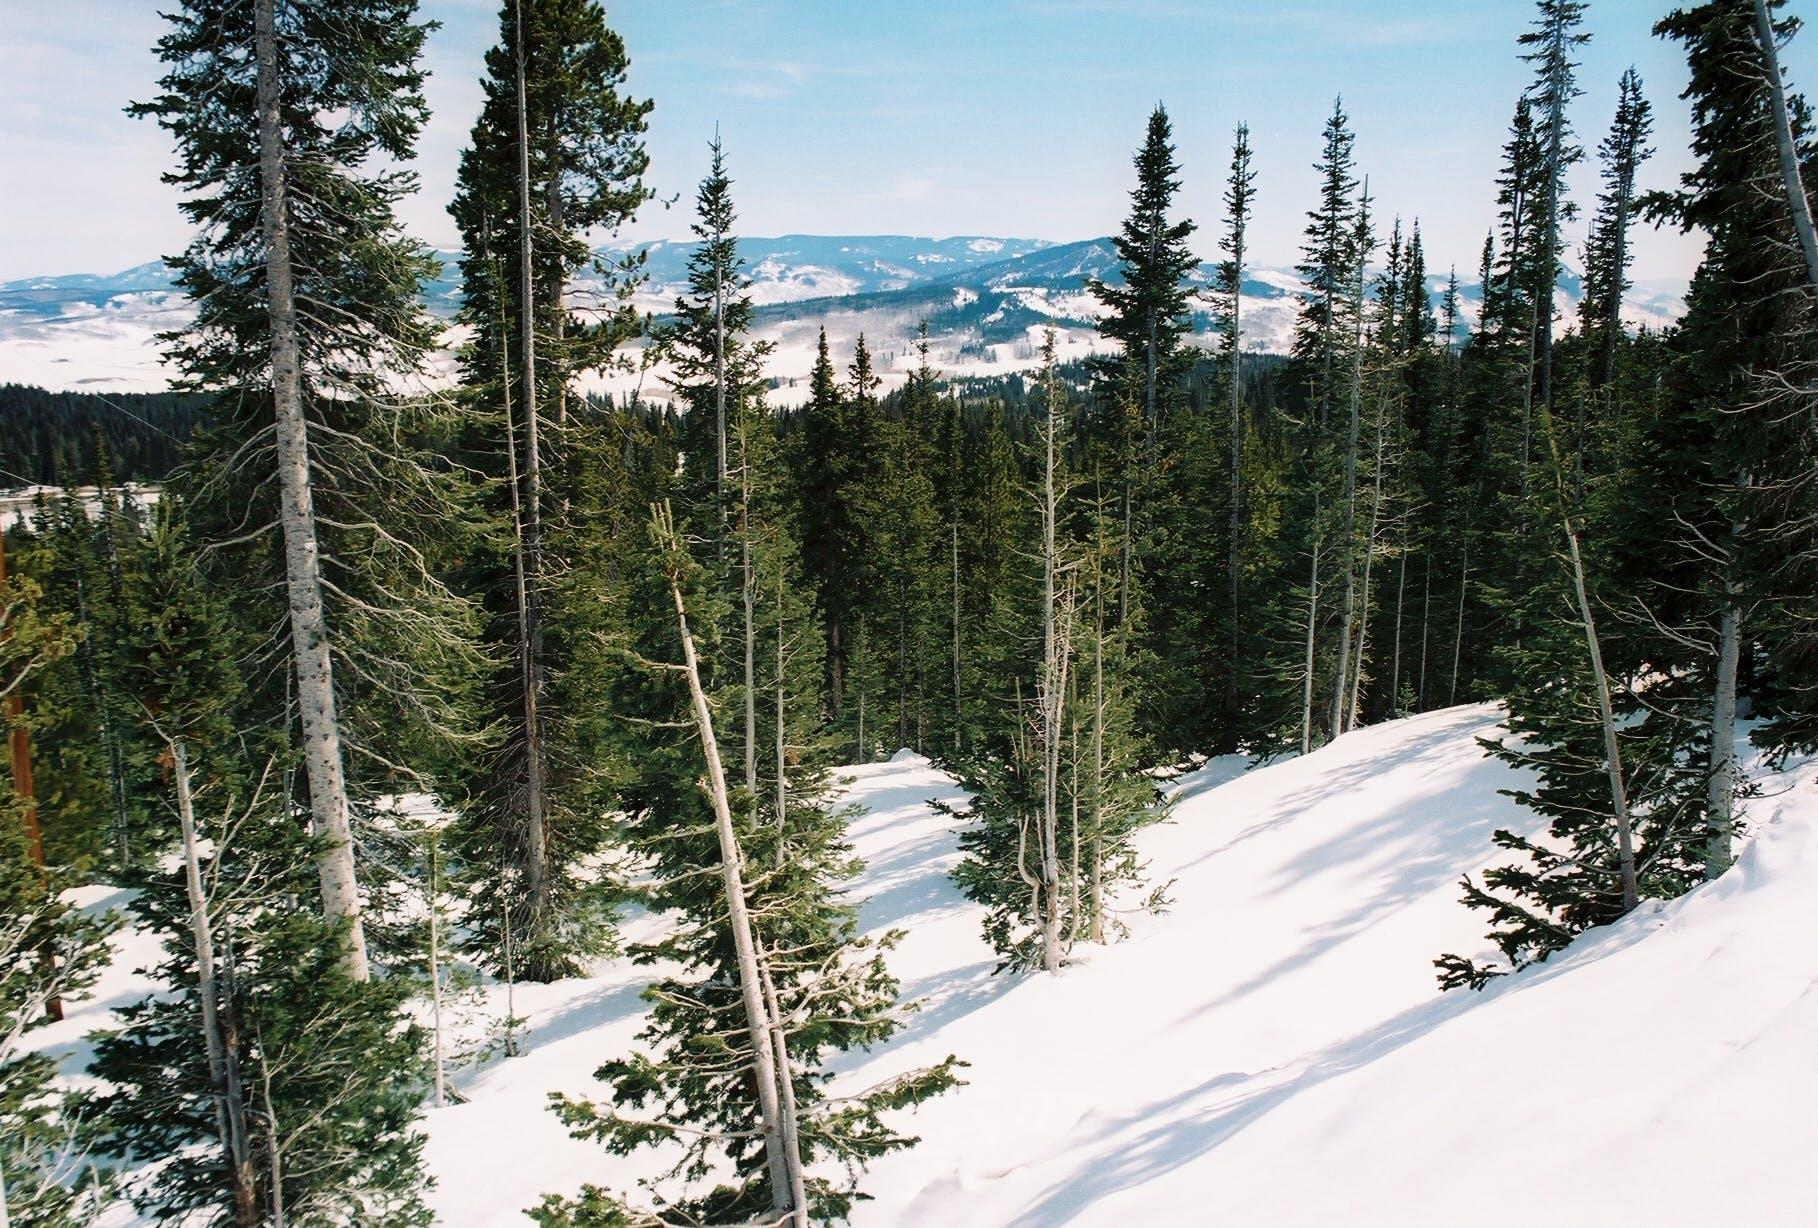 Free stock photo of snow capped mountain